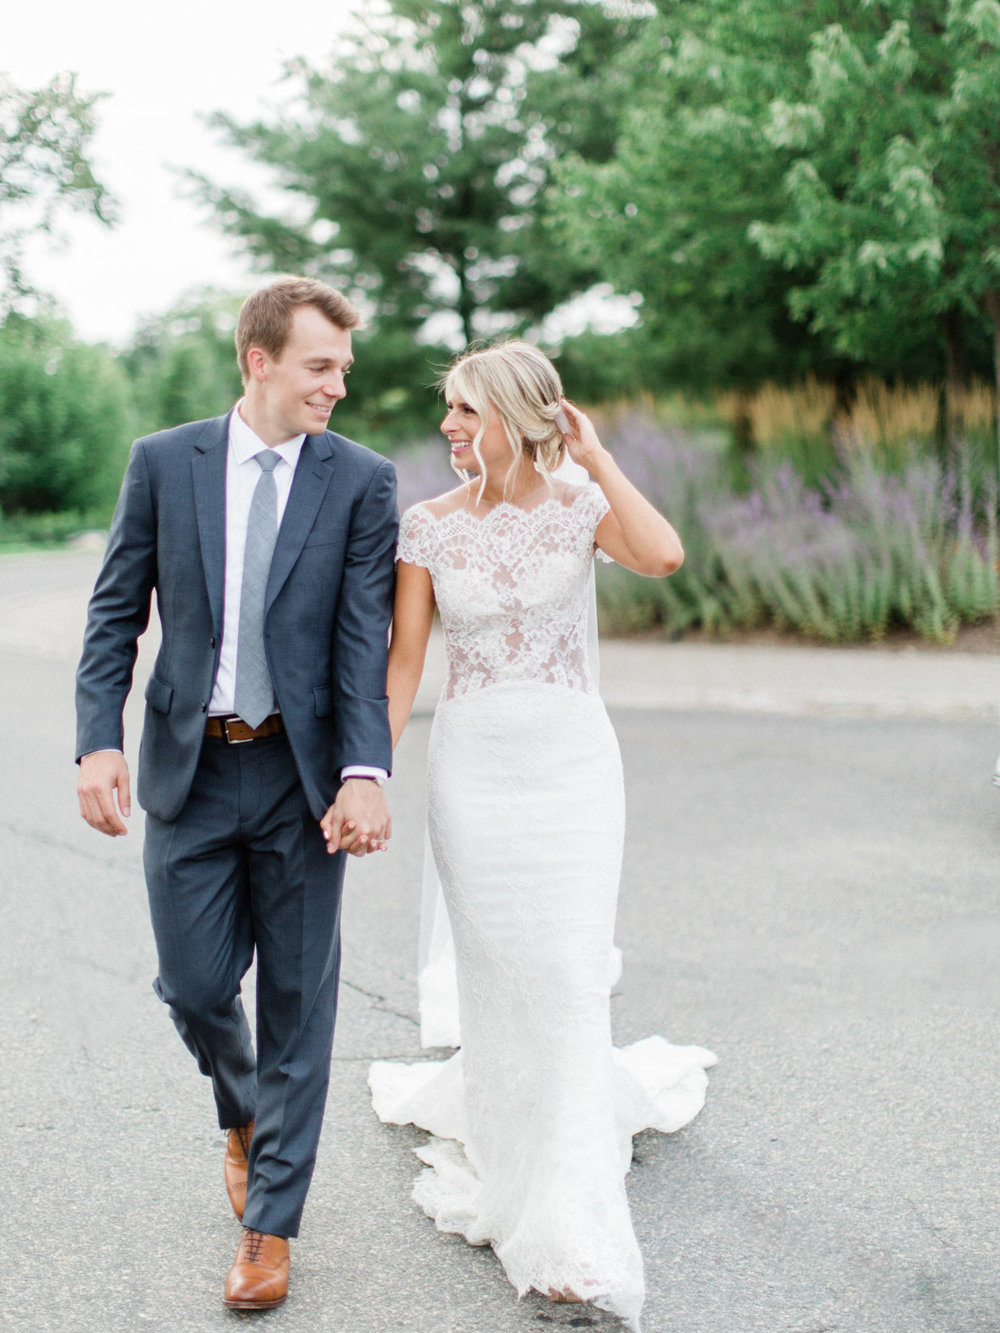 Toronto-Muskoka-wedding-photographer-summery-fun-documentary-the-marriott-rosseau103.jpg